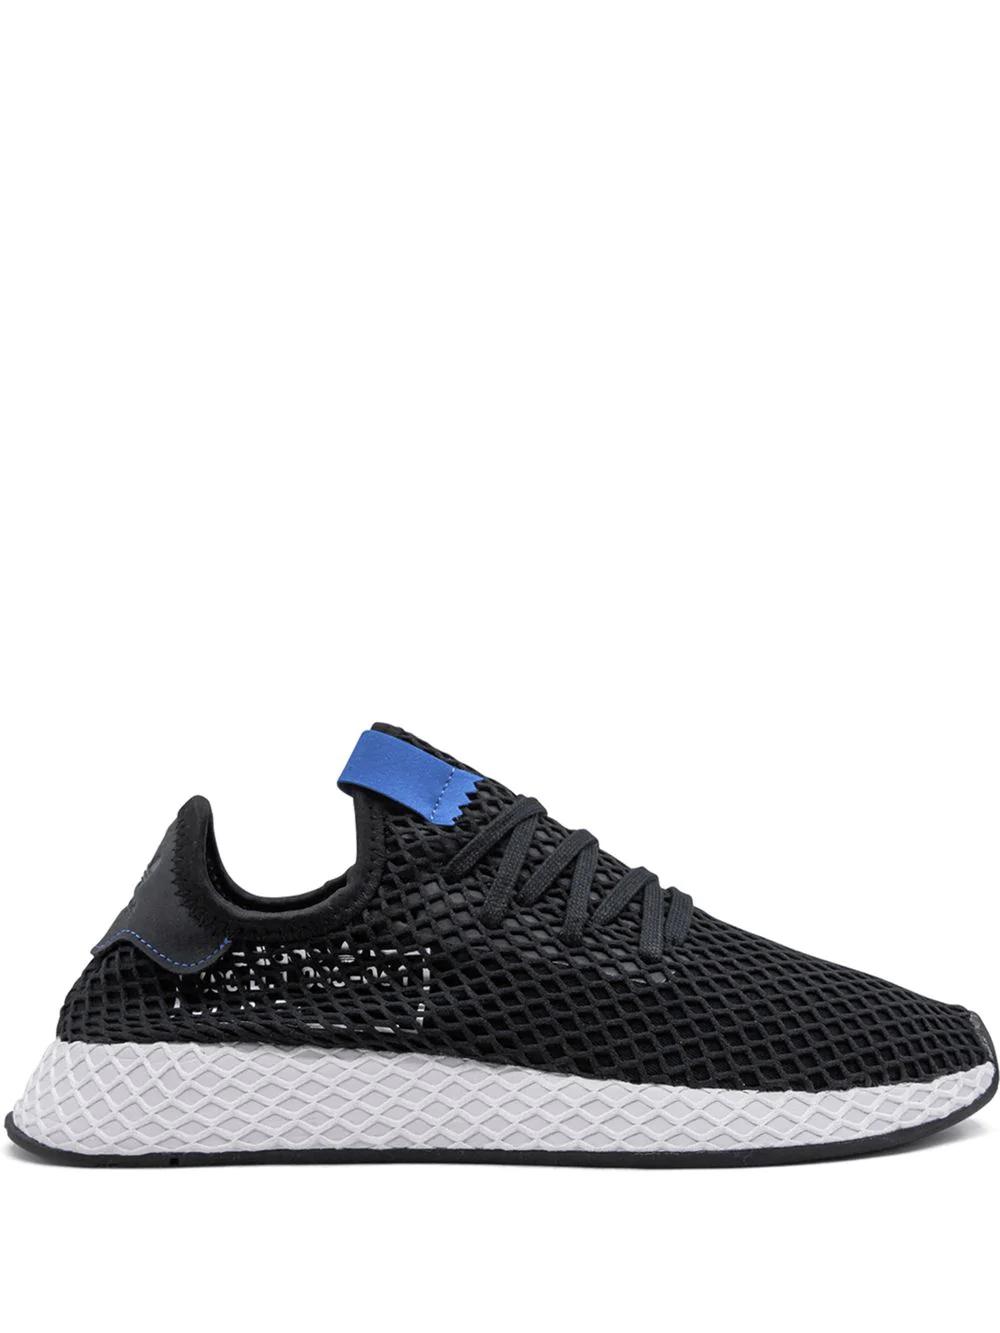 reputable site 4cbd0 06273 ADIDAS ORIGINALS. Adidas Deerupt Runner Sneakers ...